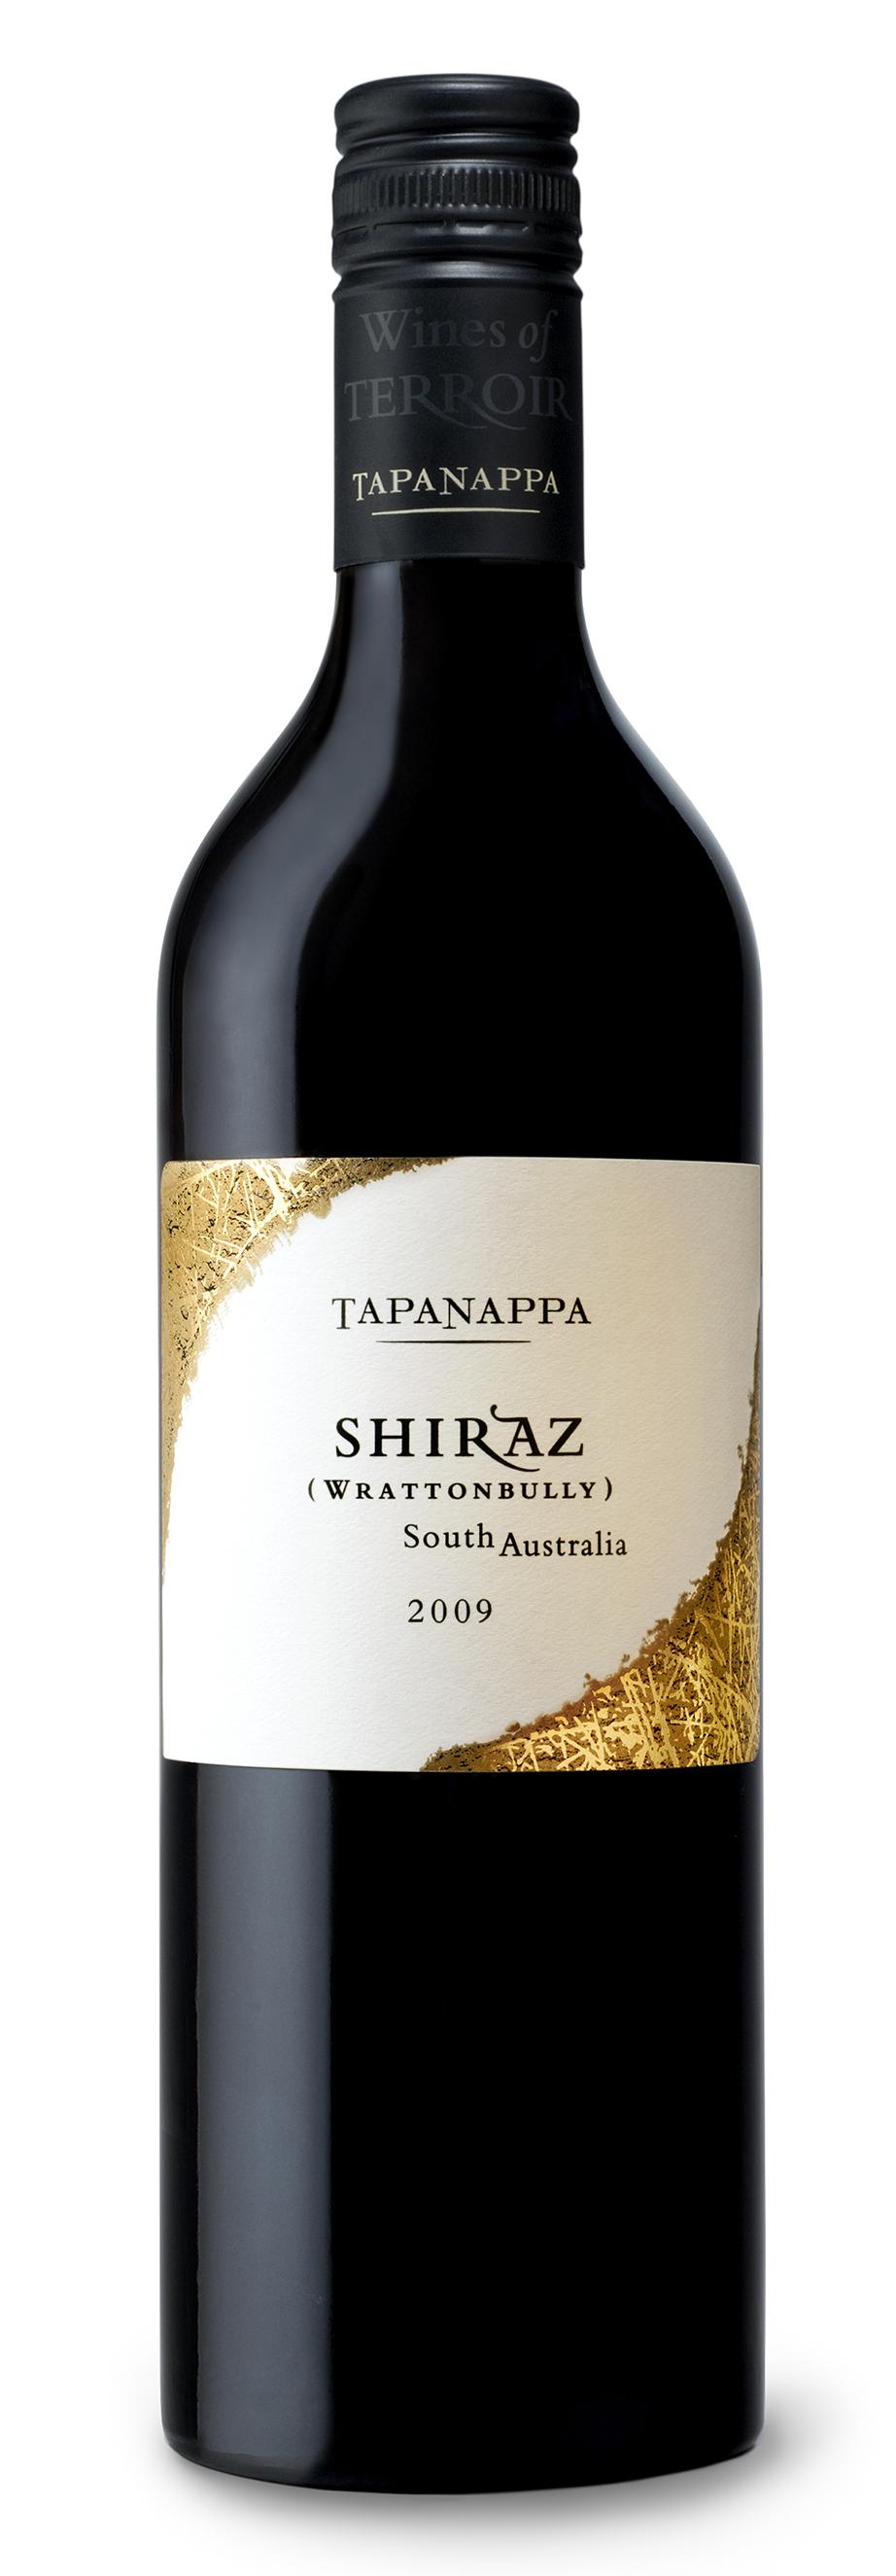 Tapanappa 2009 Wrattonbully Shiraz bottleshot